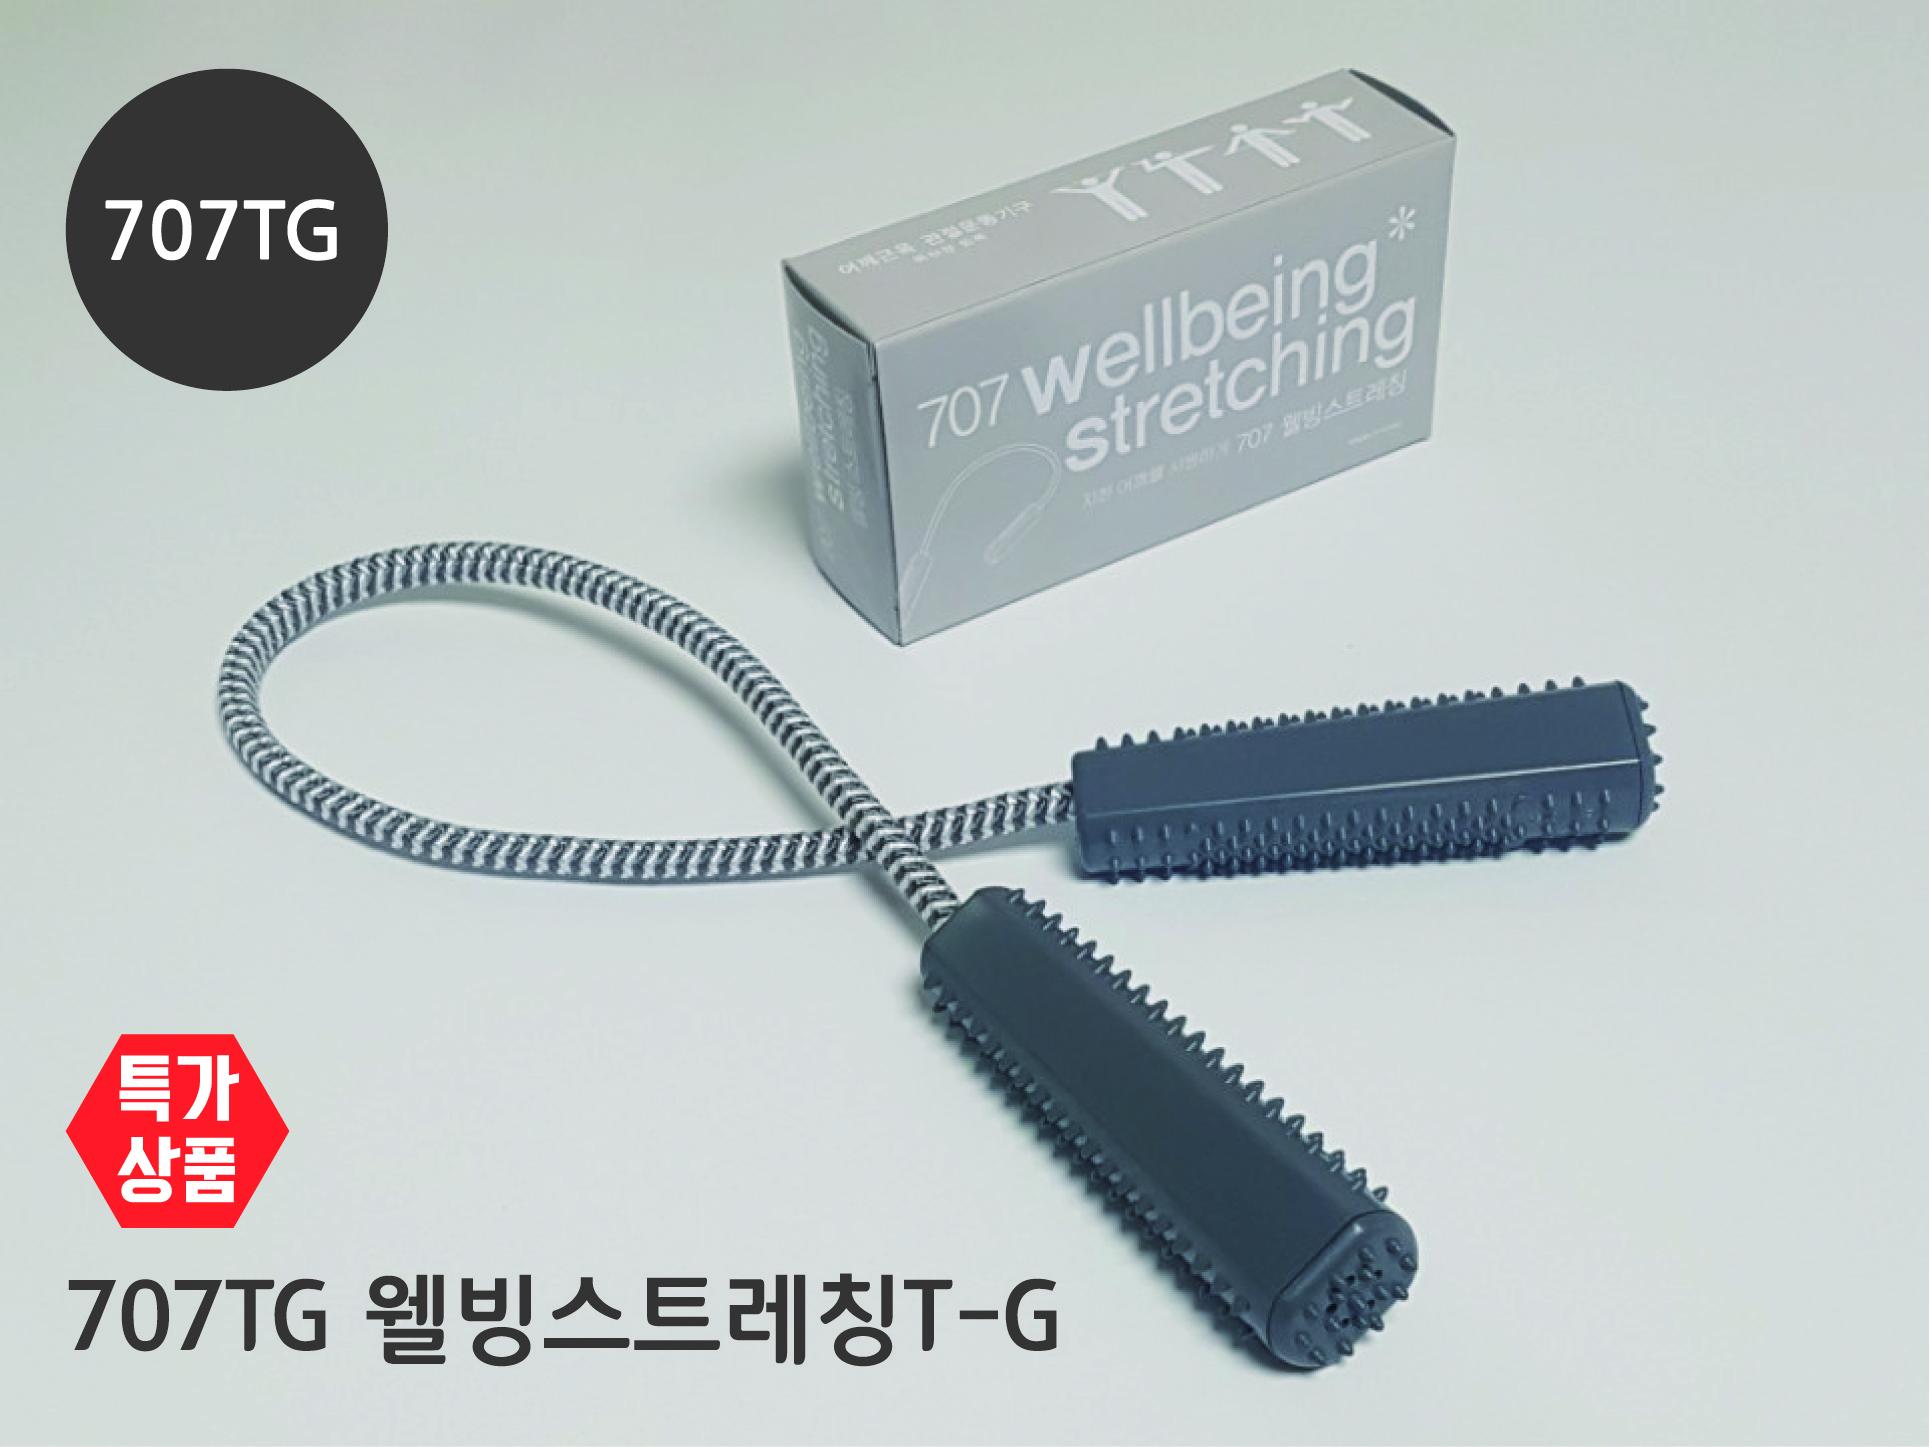 WB-707TG 웰빙스트레칭